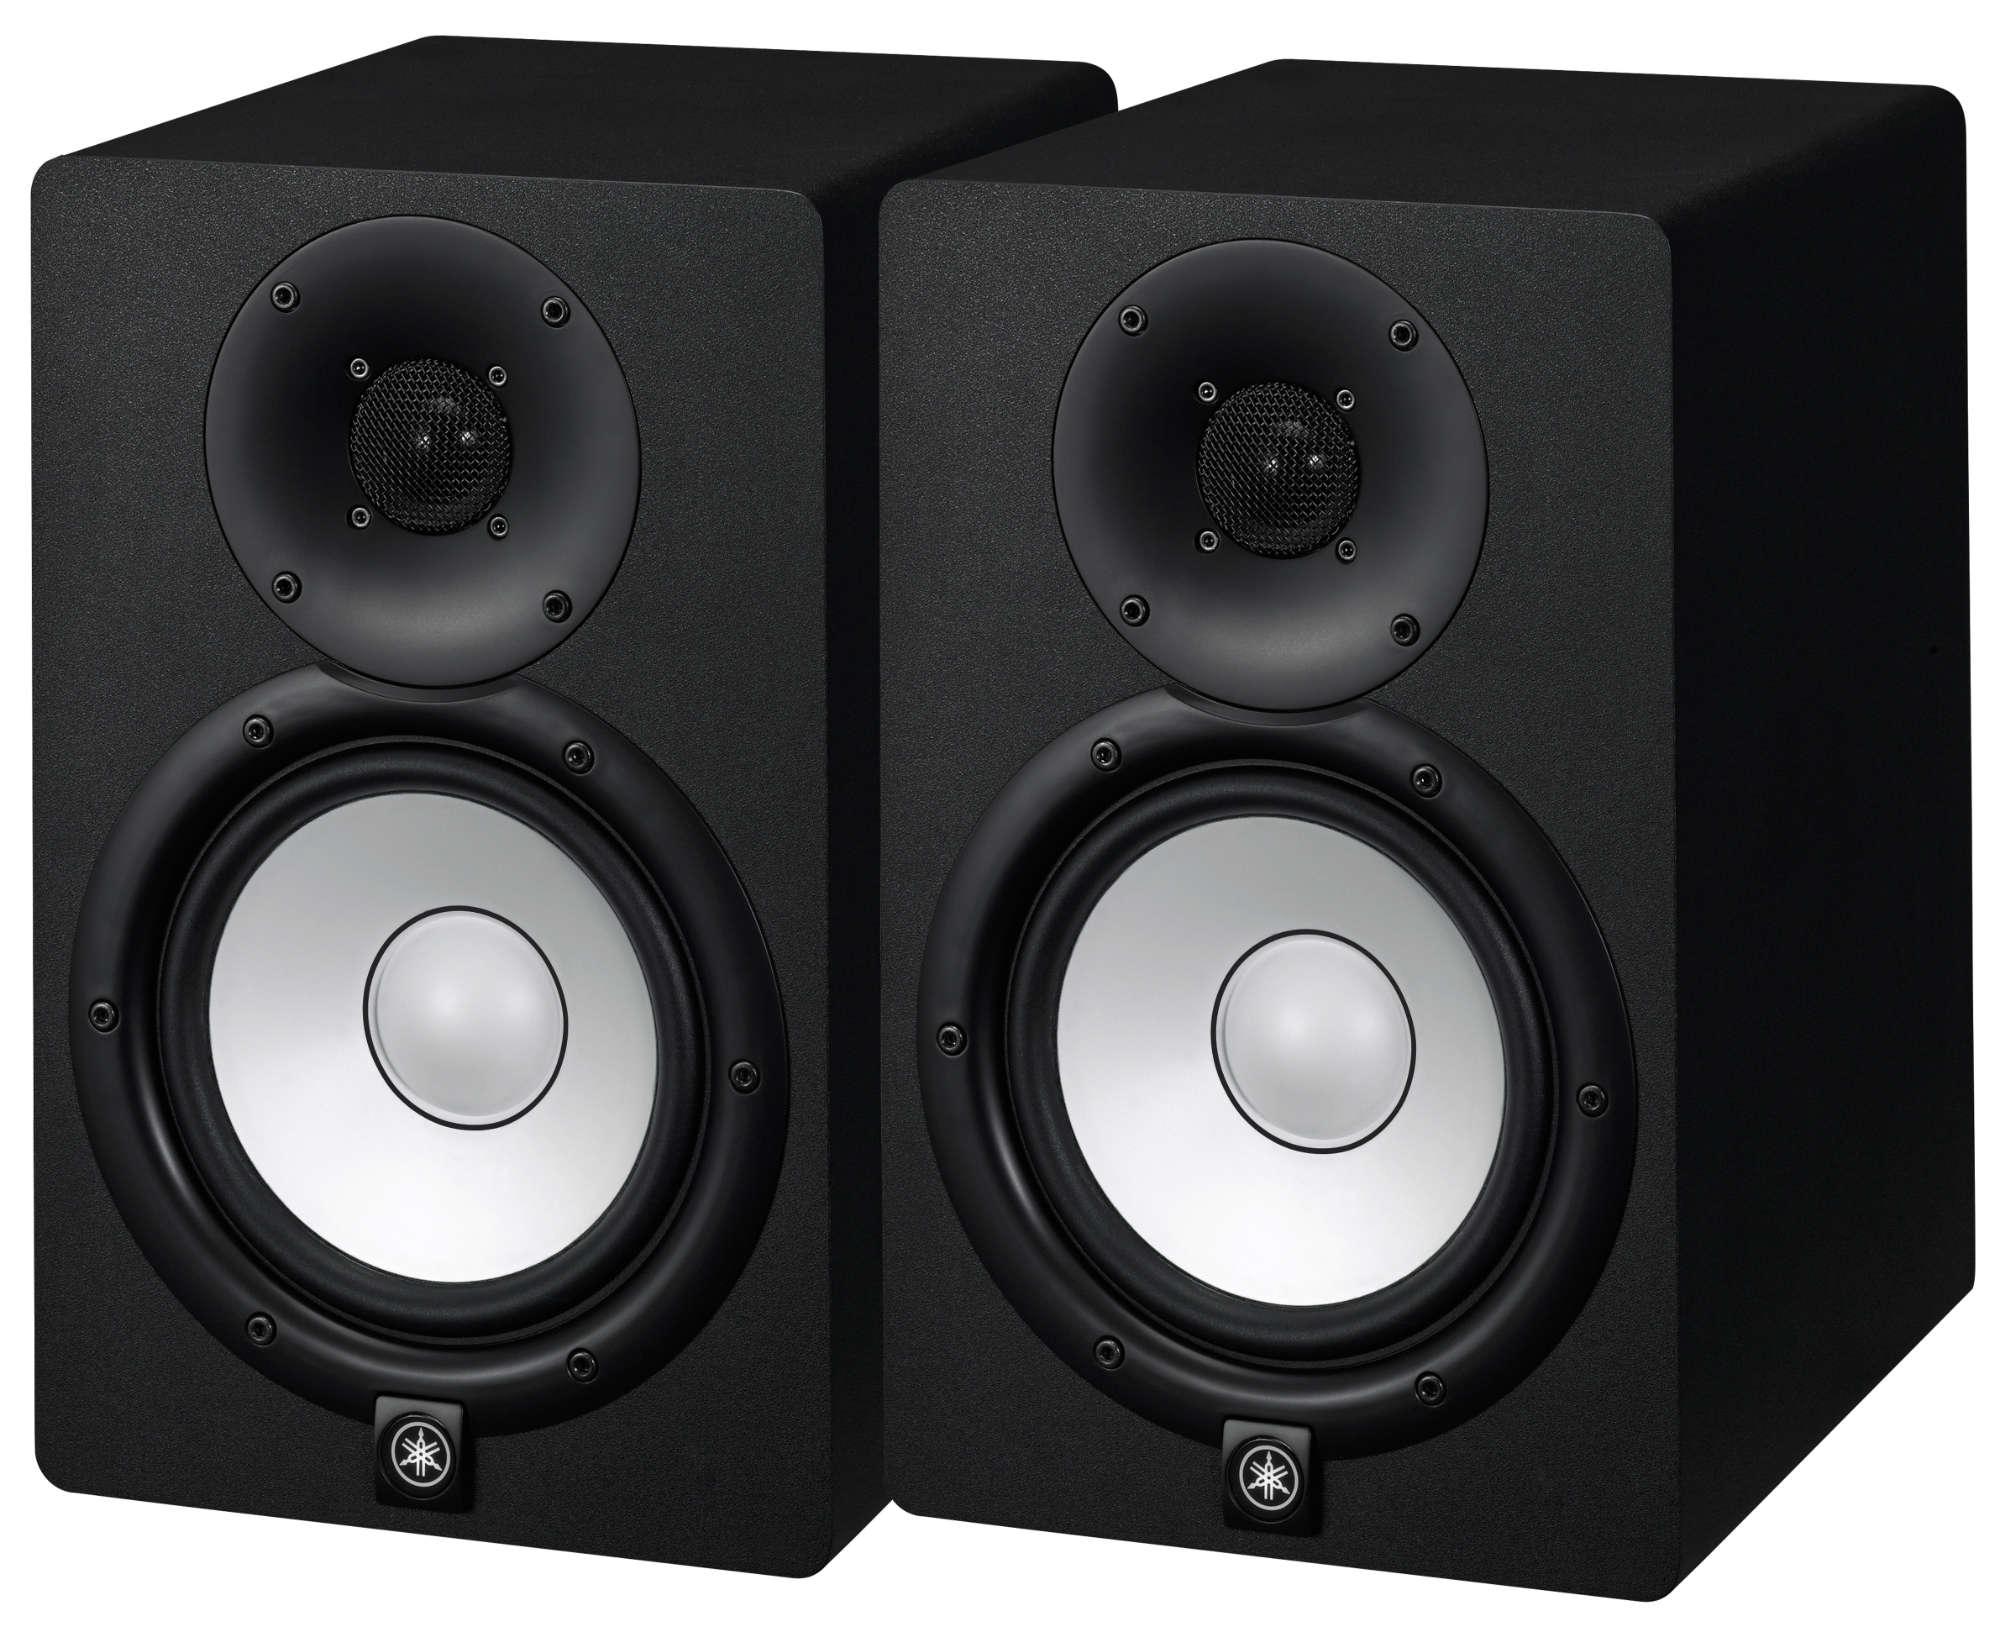 Studiomonitore - Yamaha HS7 MP - Onlineshop Musikhaus Kirstein